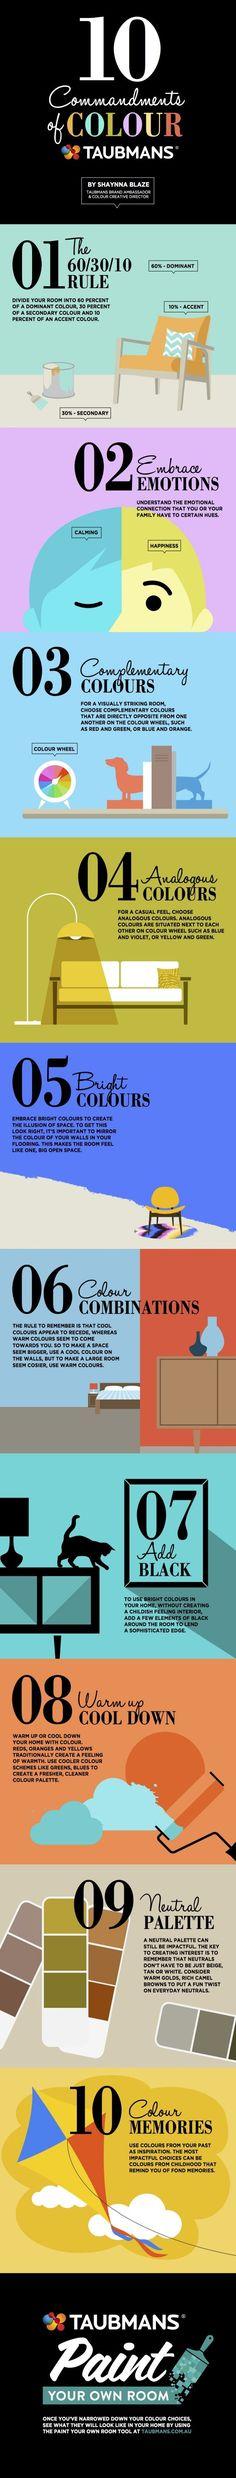 Great Color Scheme Guide | Shaynna Blaze's 10 Commandments of Color | via @theinteriorsaddict